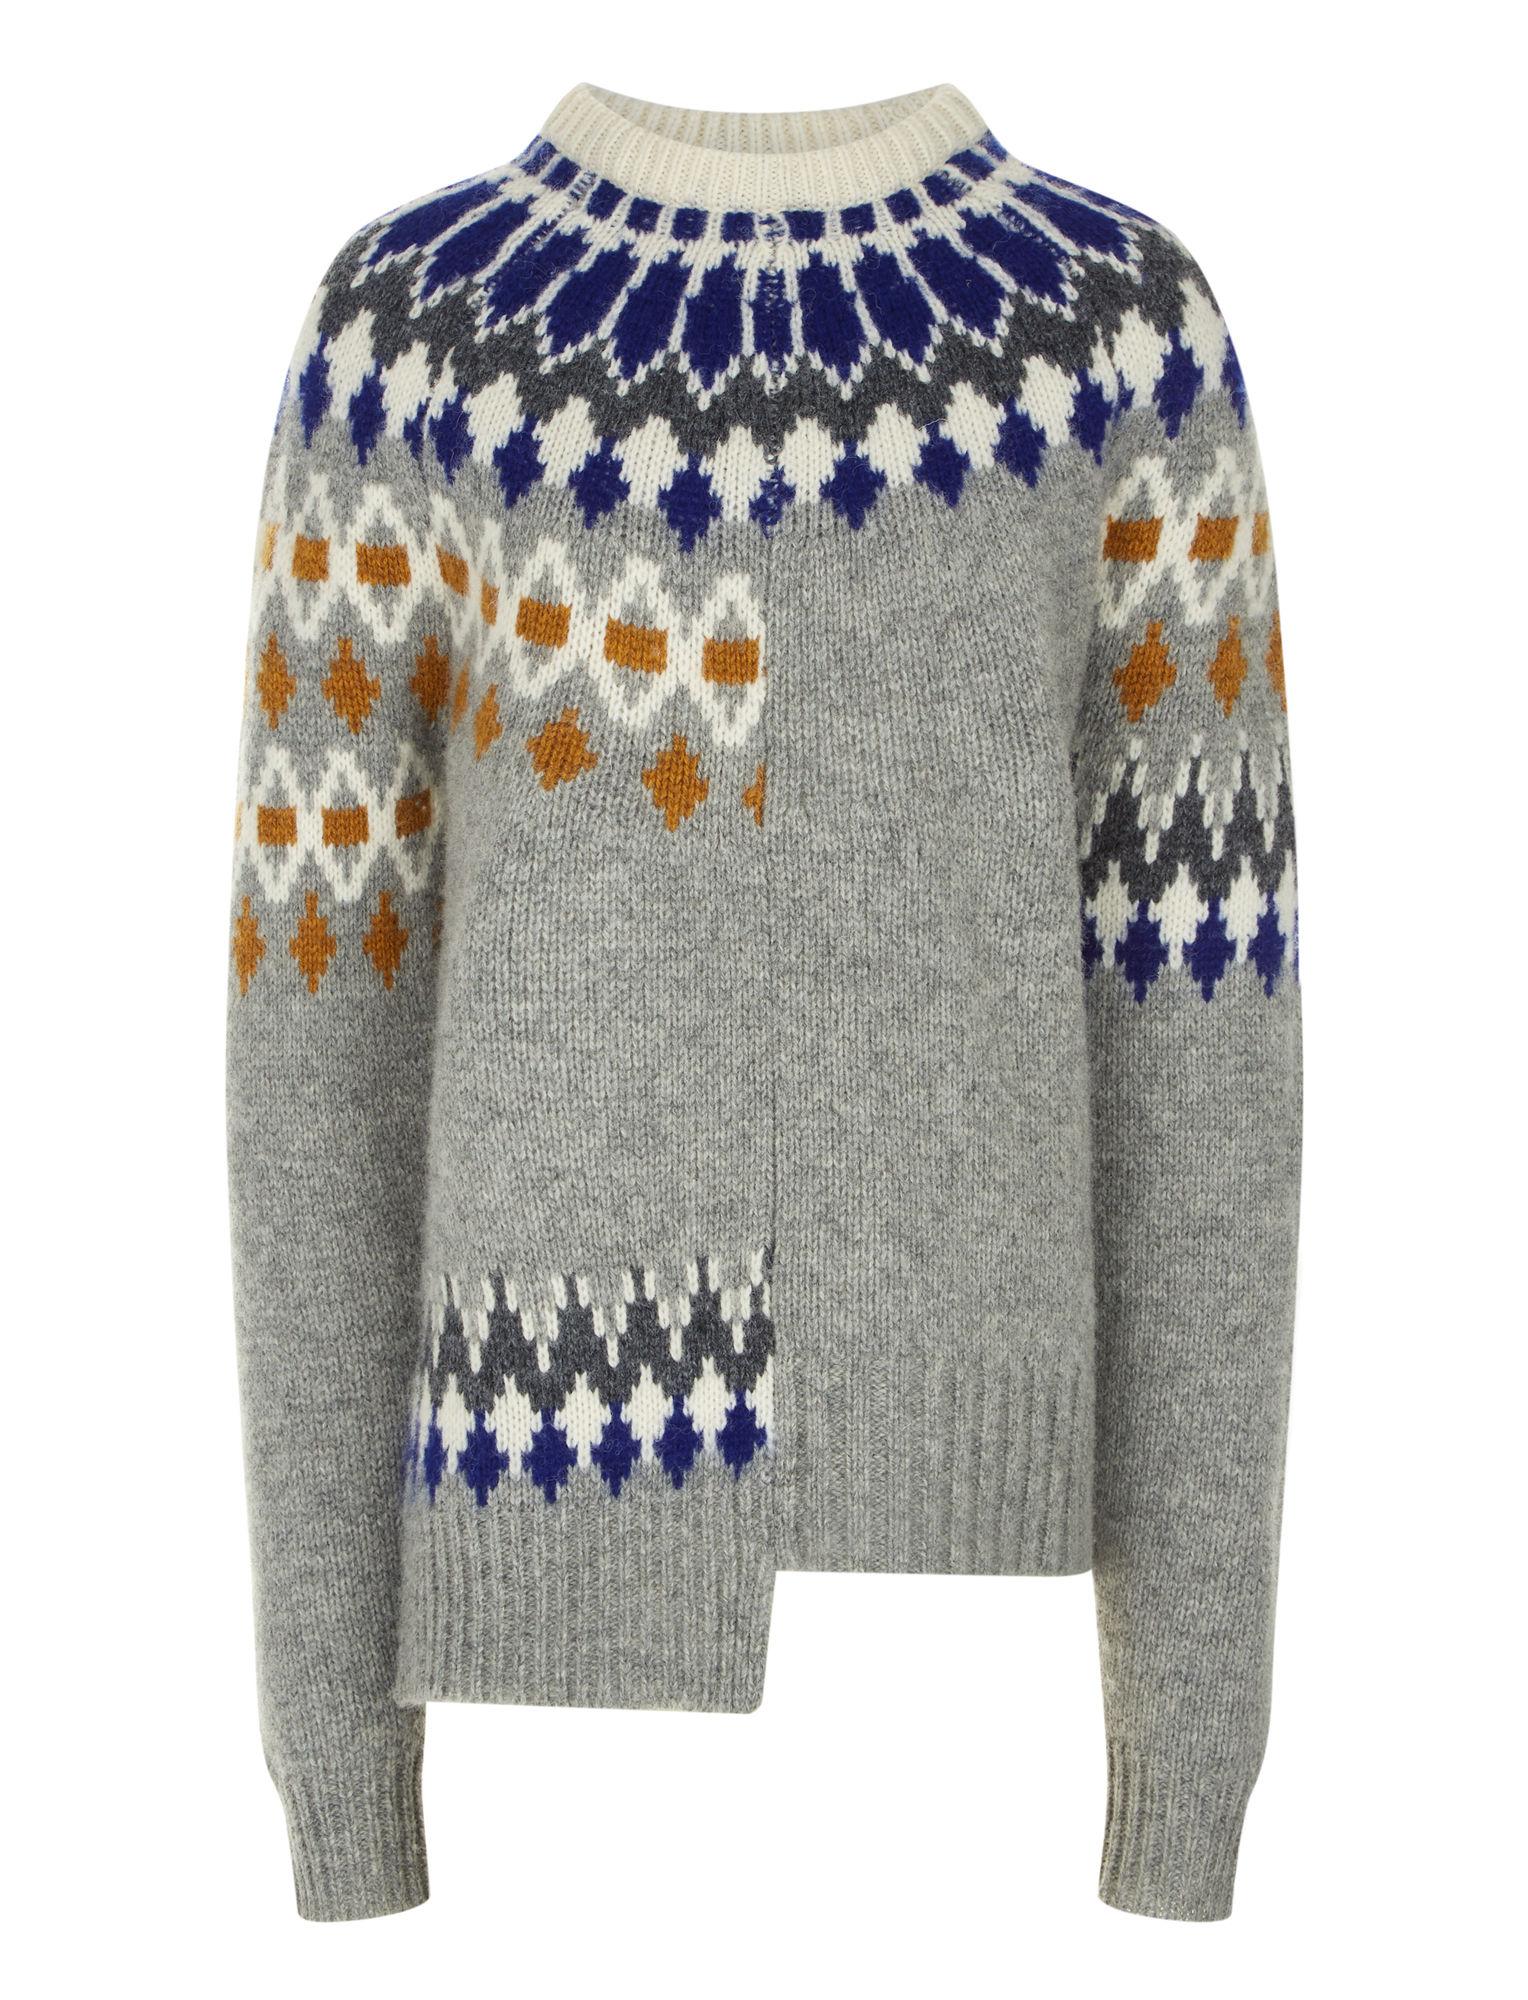 JOSEPH-Patchwork-Sweater-Fair-Isle-Knit-Multicolor-jf0018630050-1.jpg